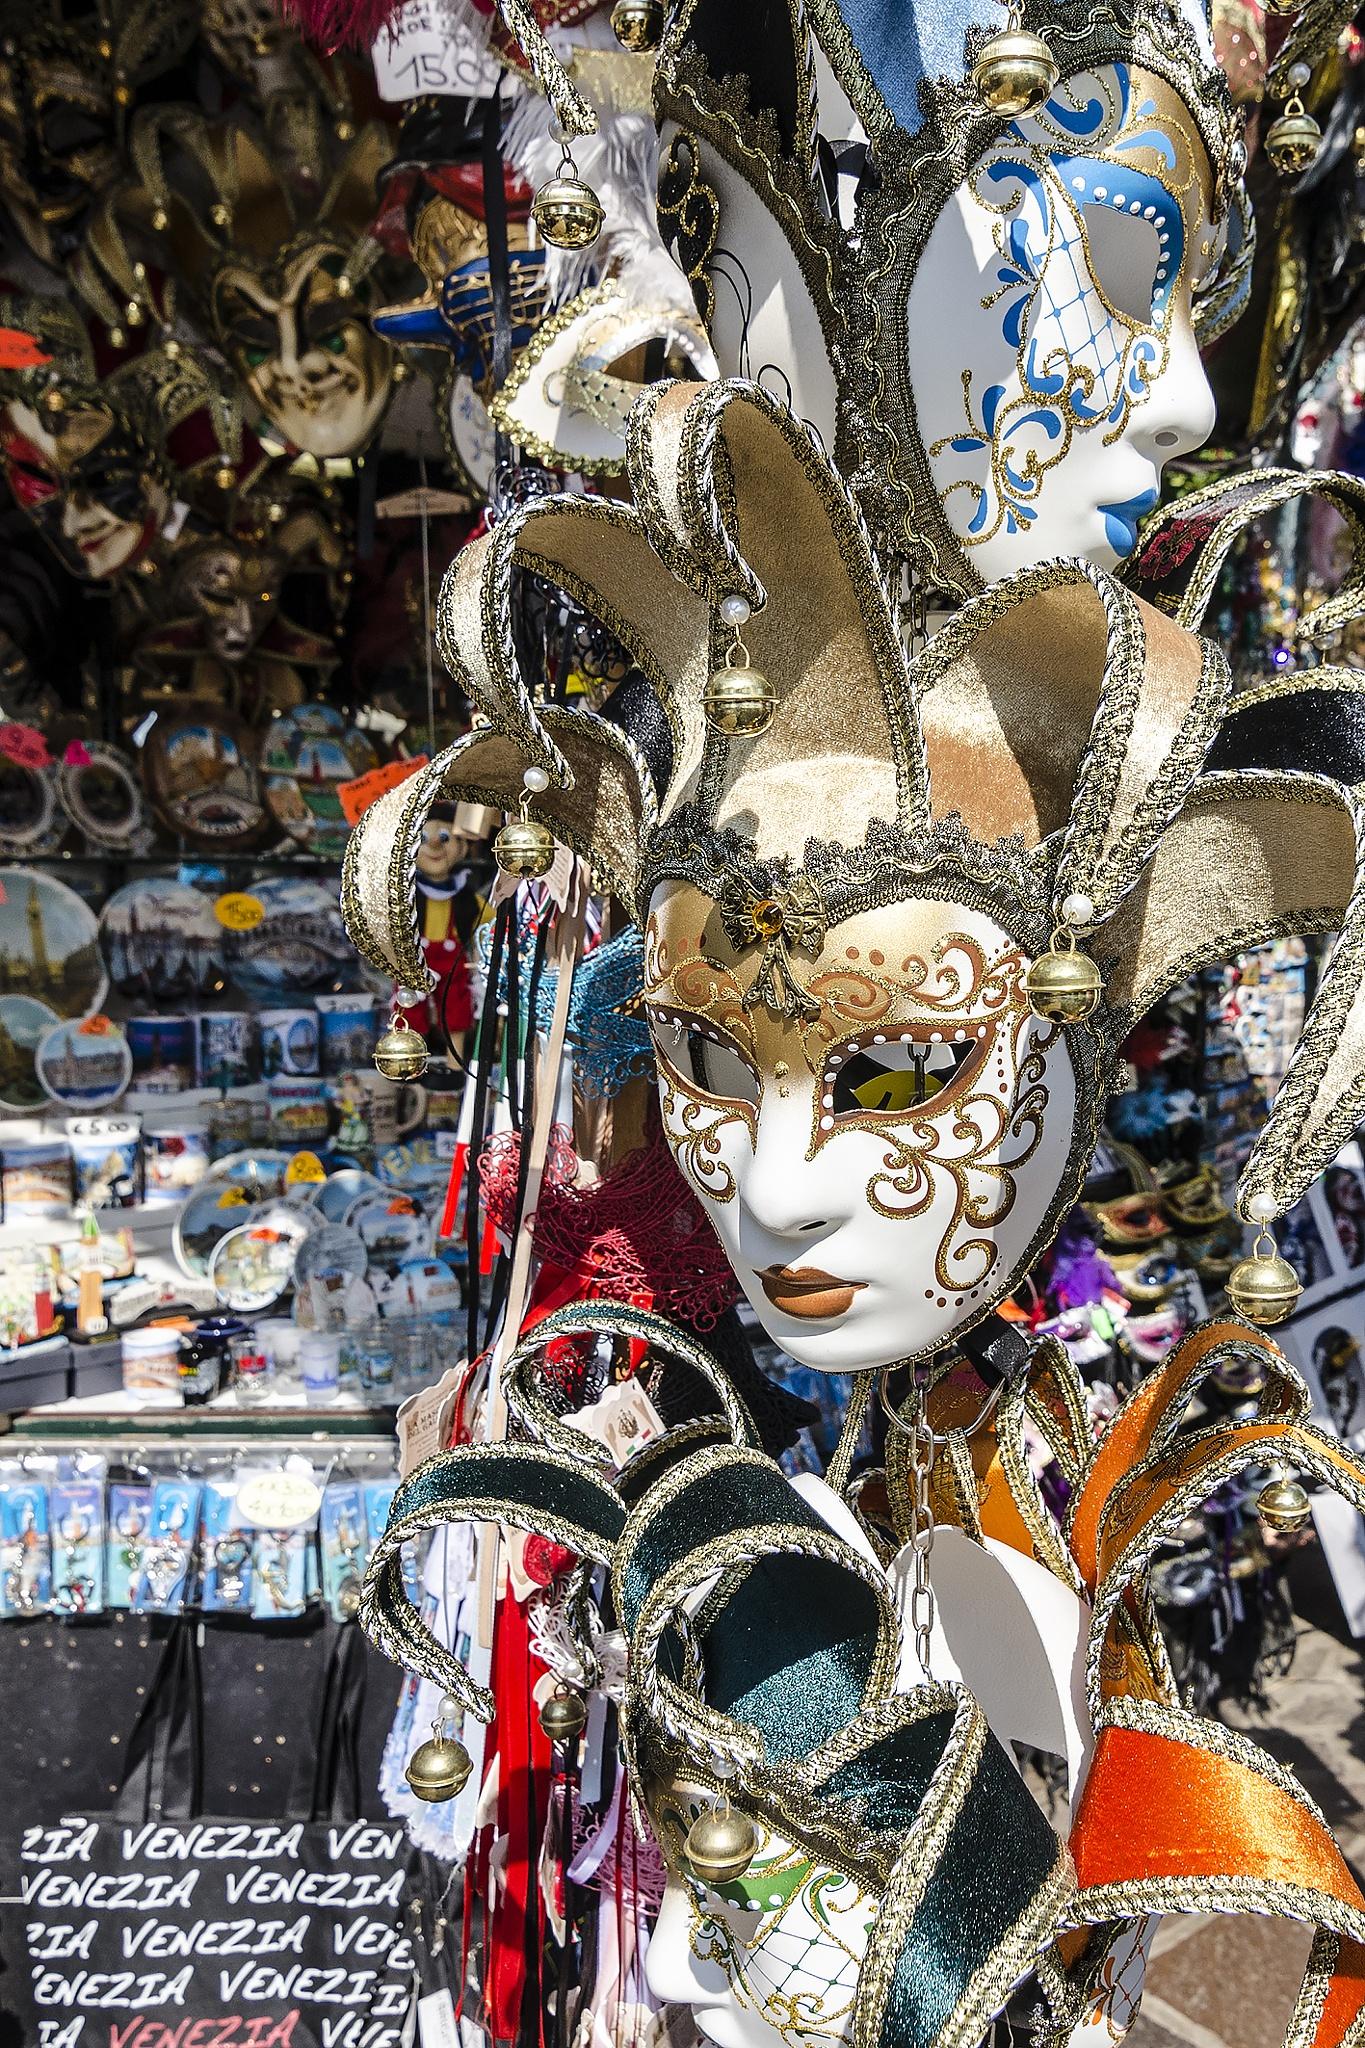 Mask in Venice by Ivo Ivanov